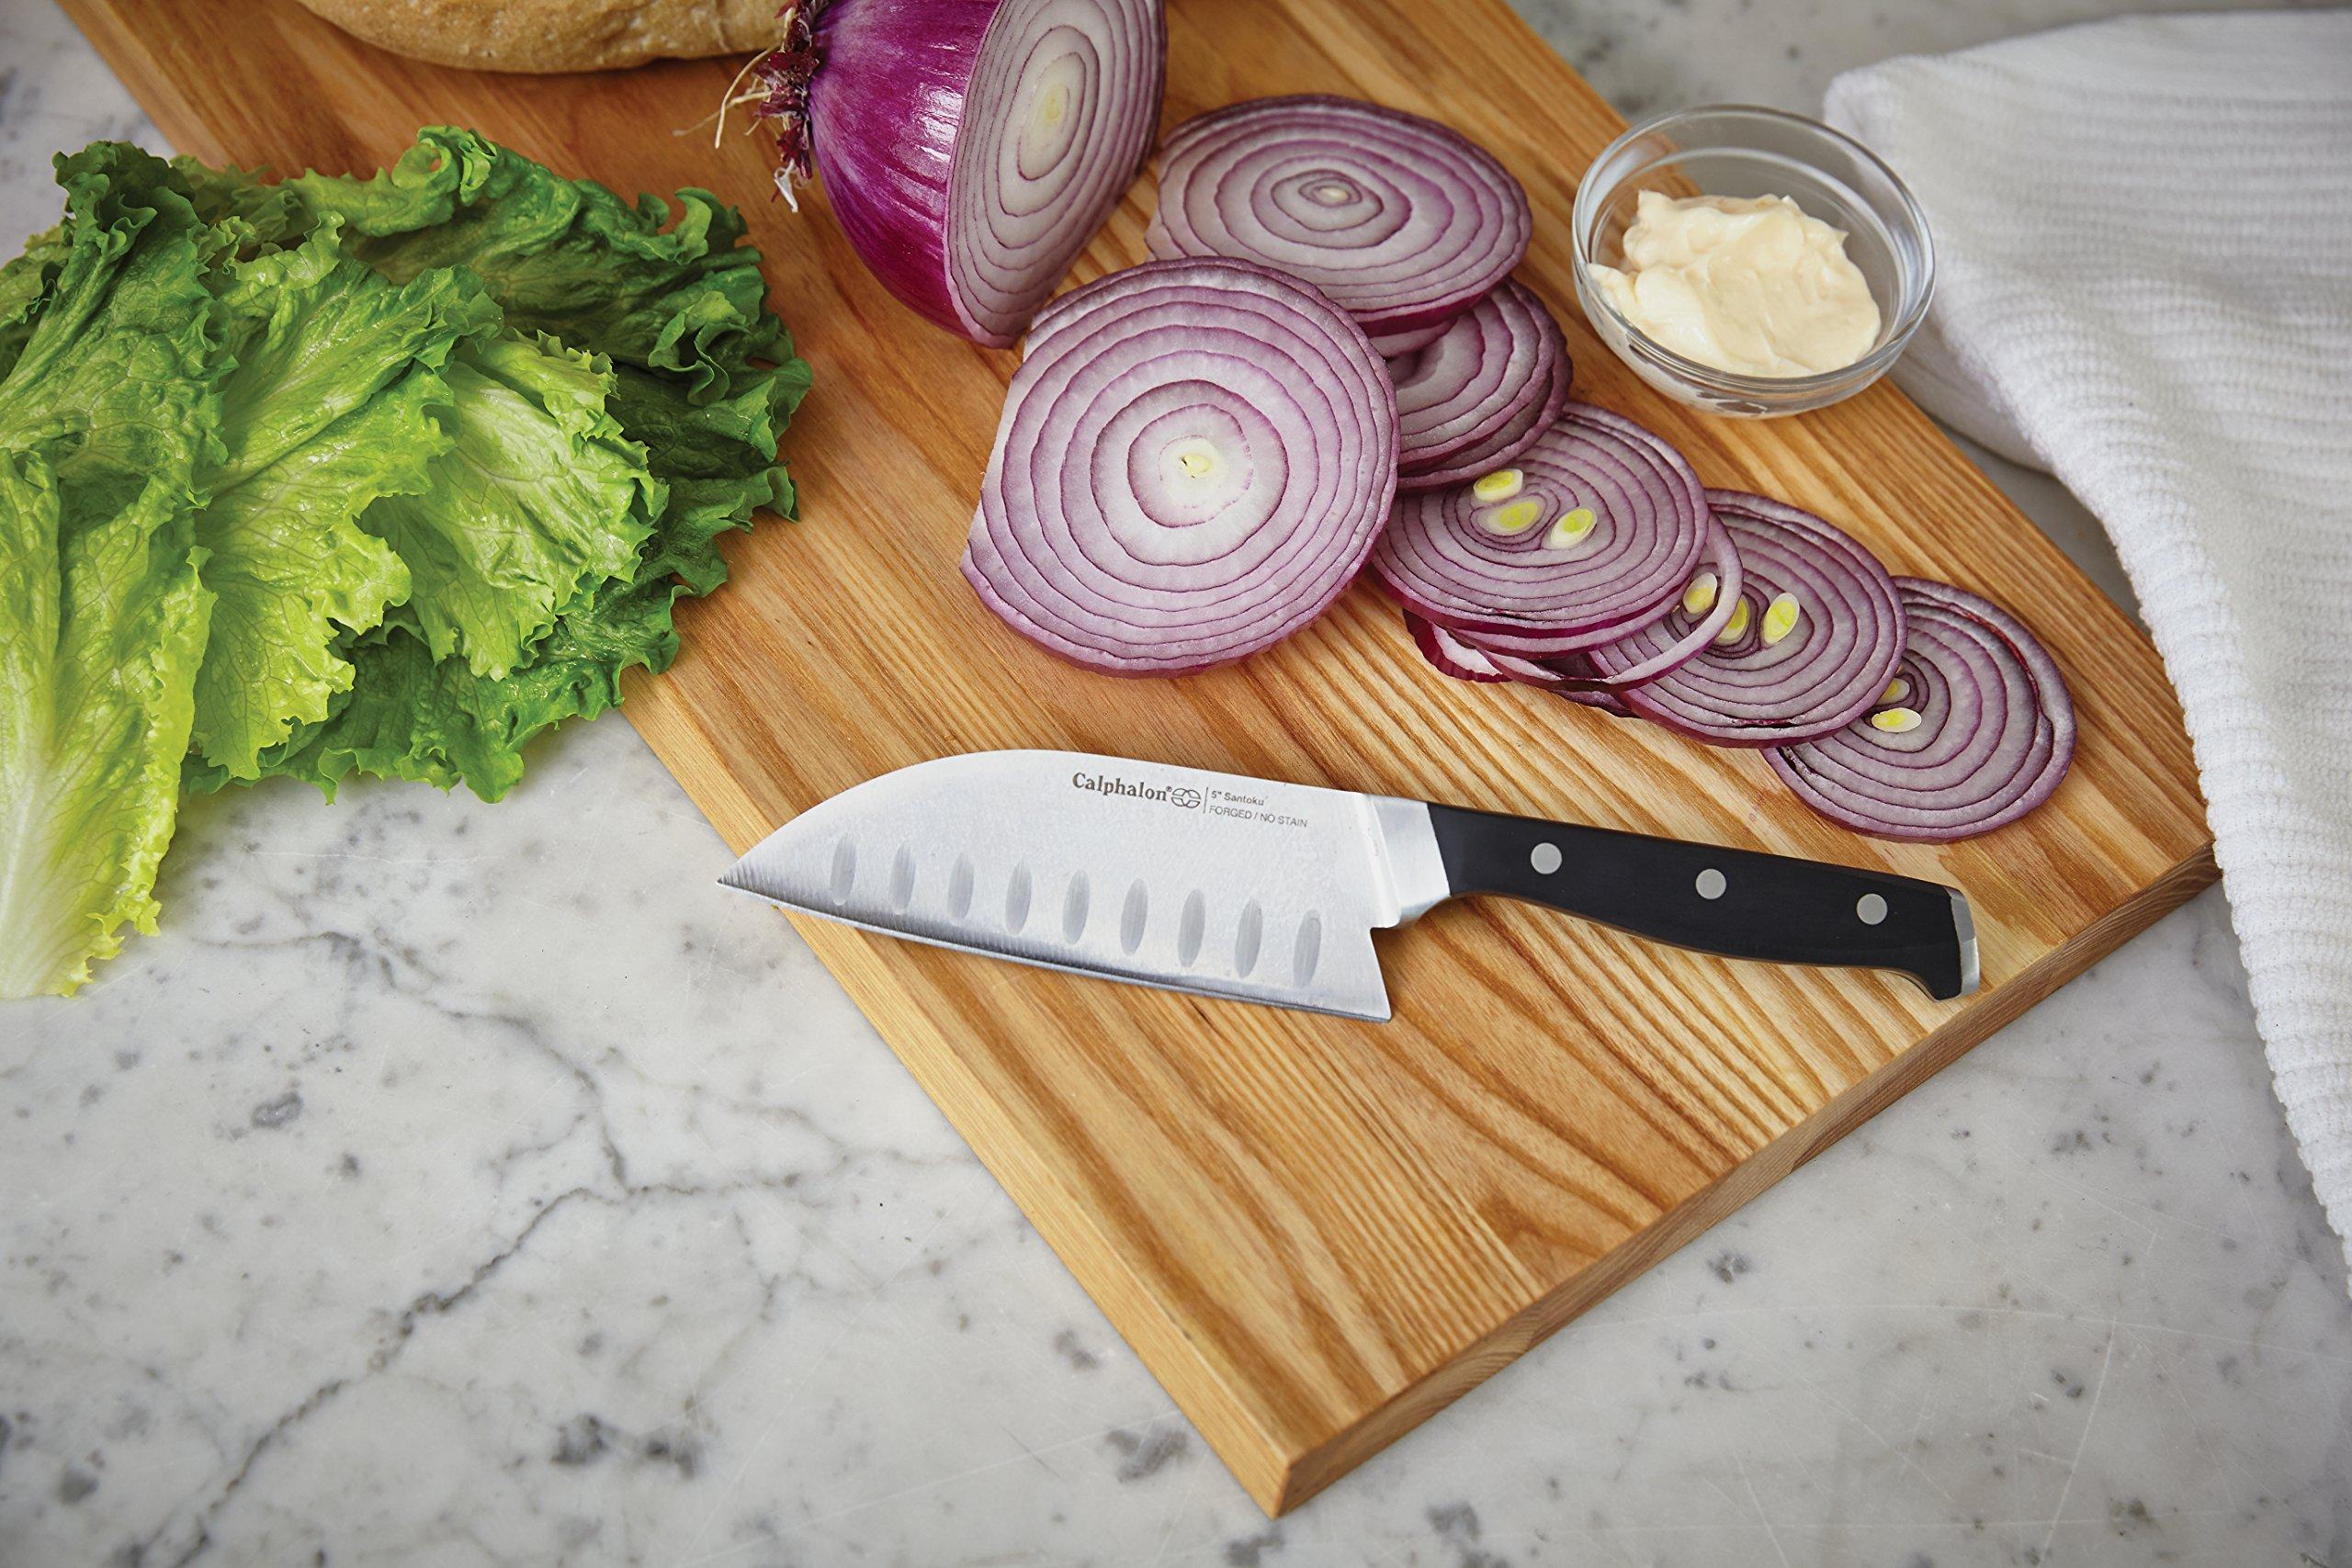 Calphalon Classic Self-Sharpening 15-pc. Cutlery Knife Block Set by Calphalon (Image #6)